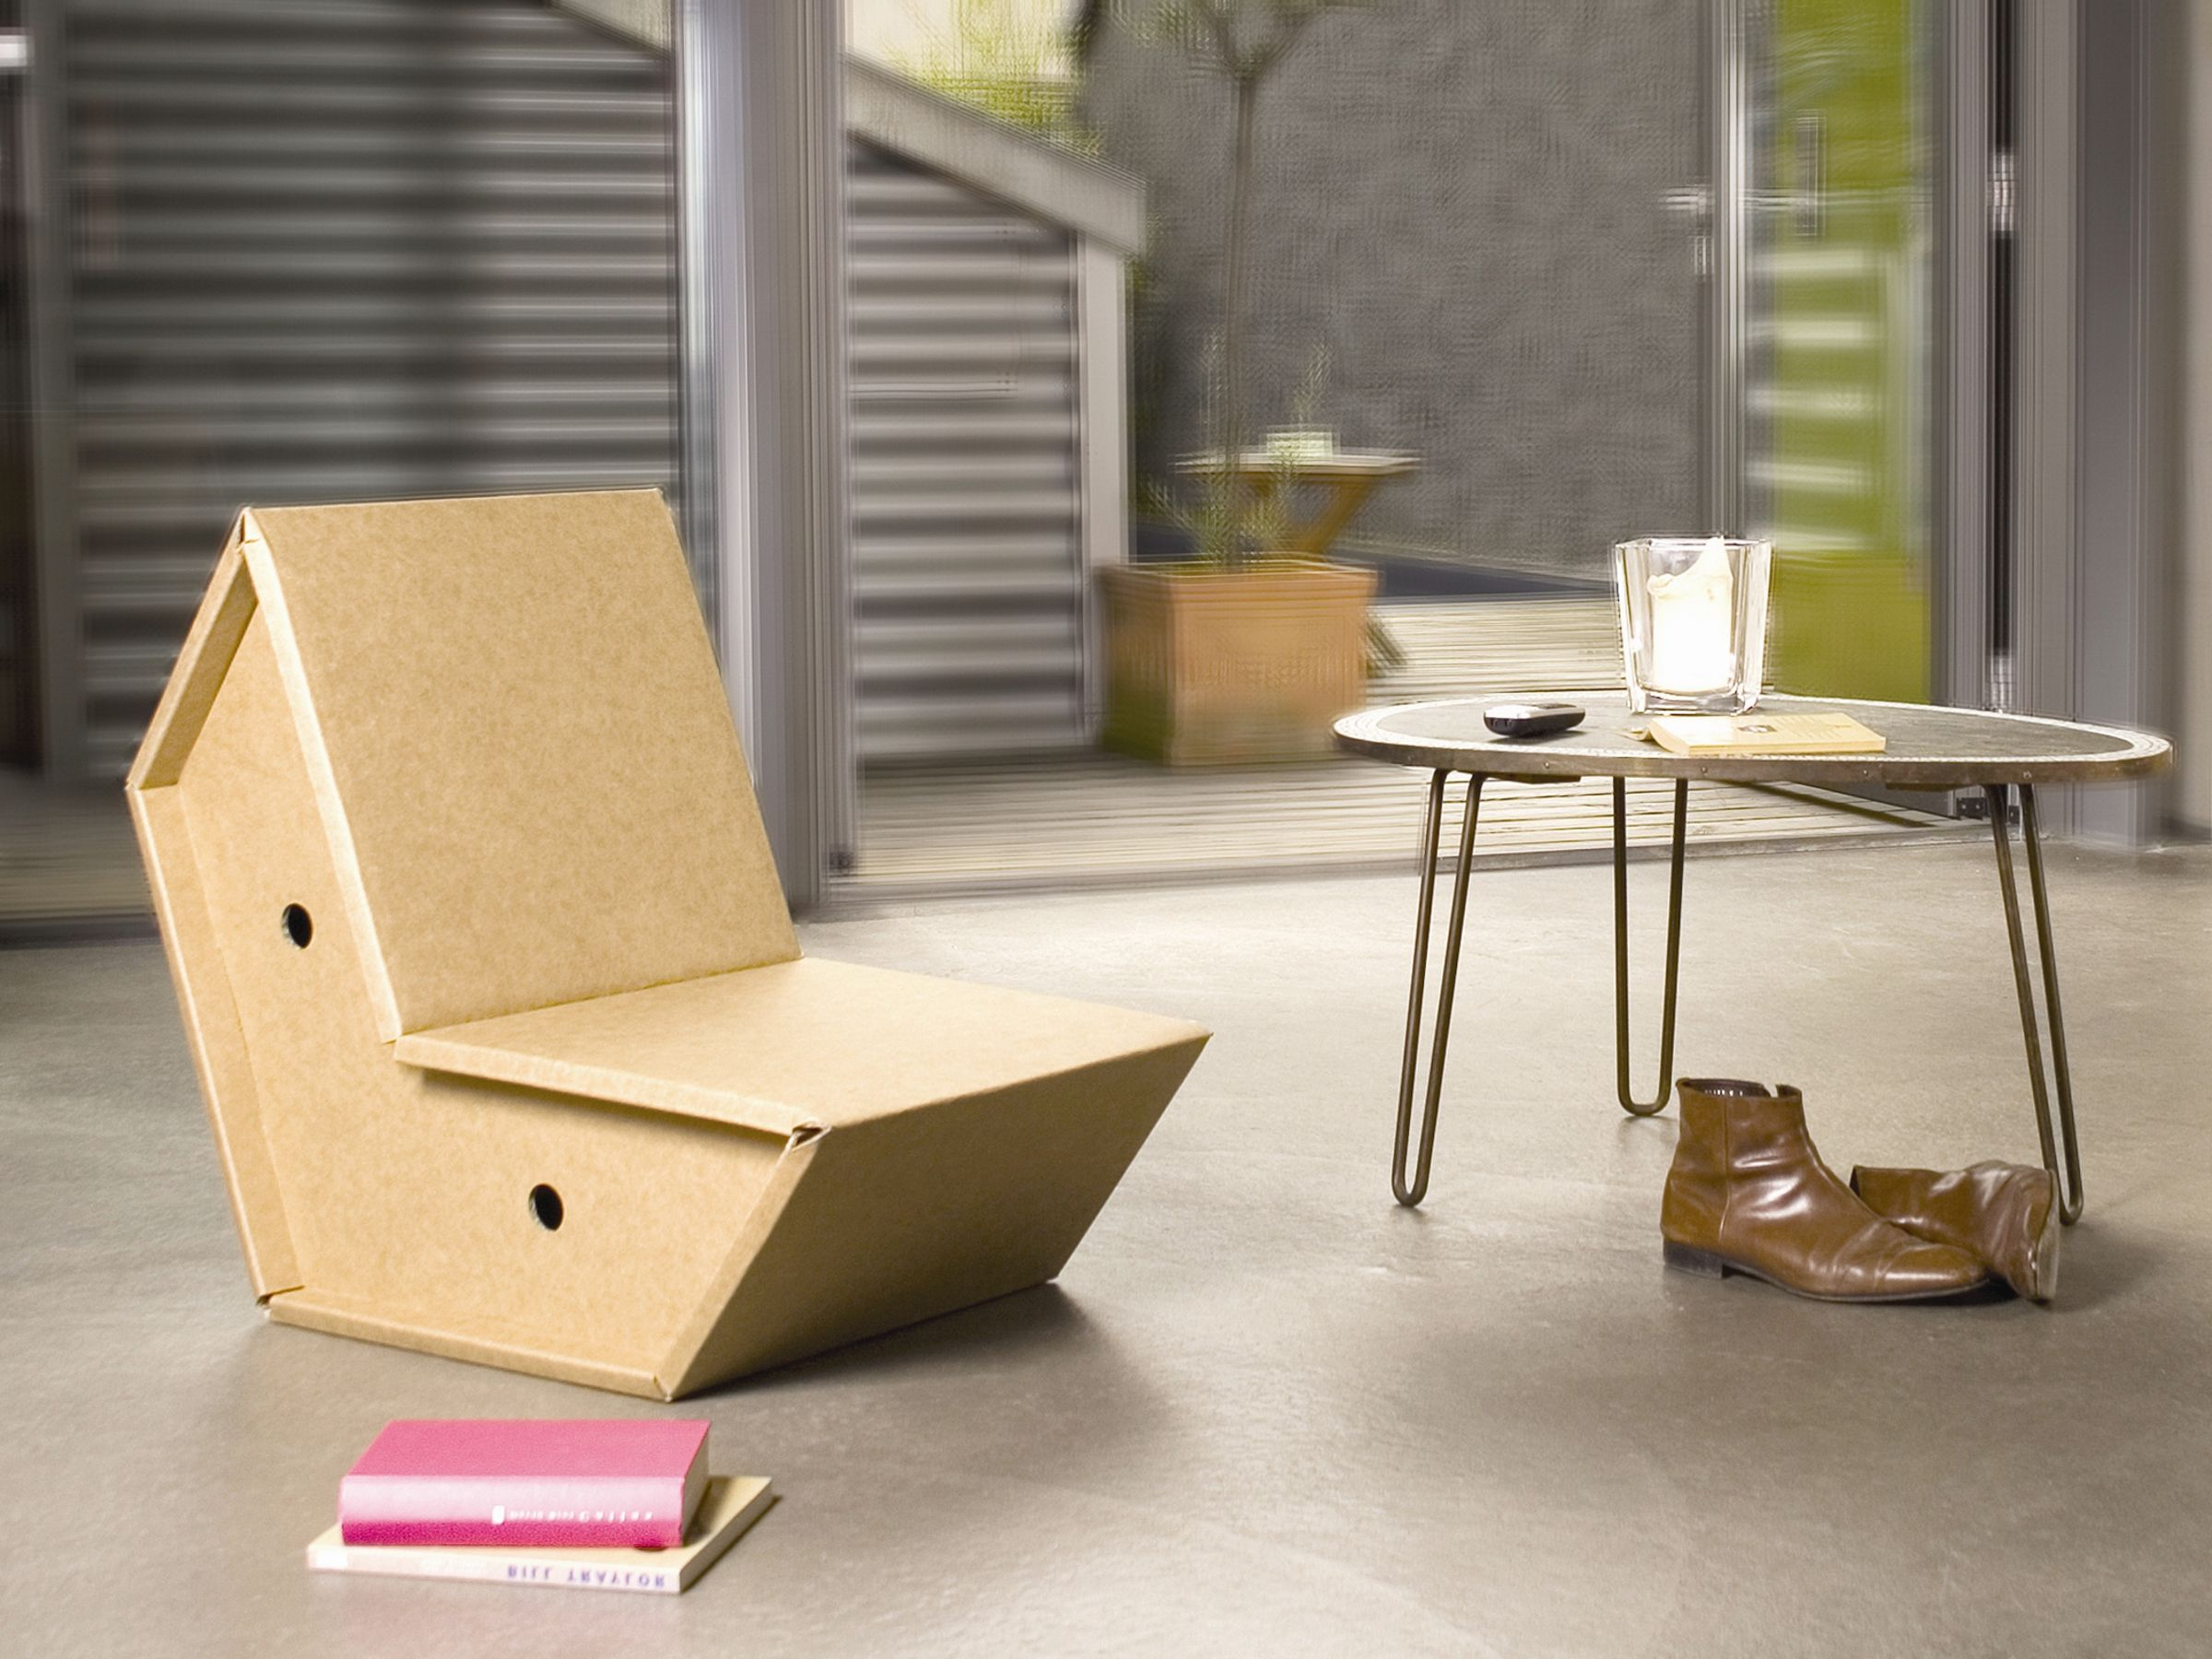 Silla de cartón OTTO by pulpo, Ursula L\'hoste diseño Peter Raacke ...